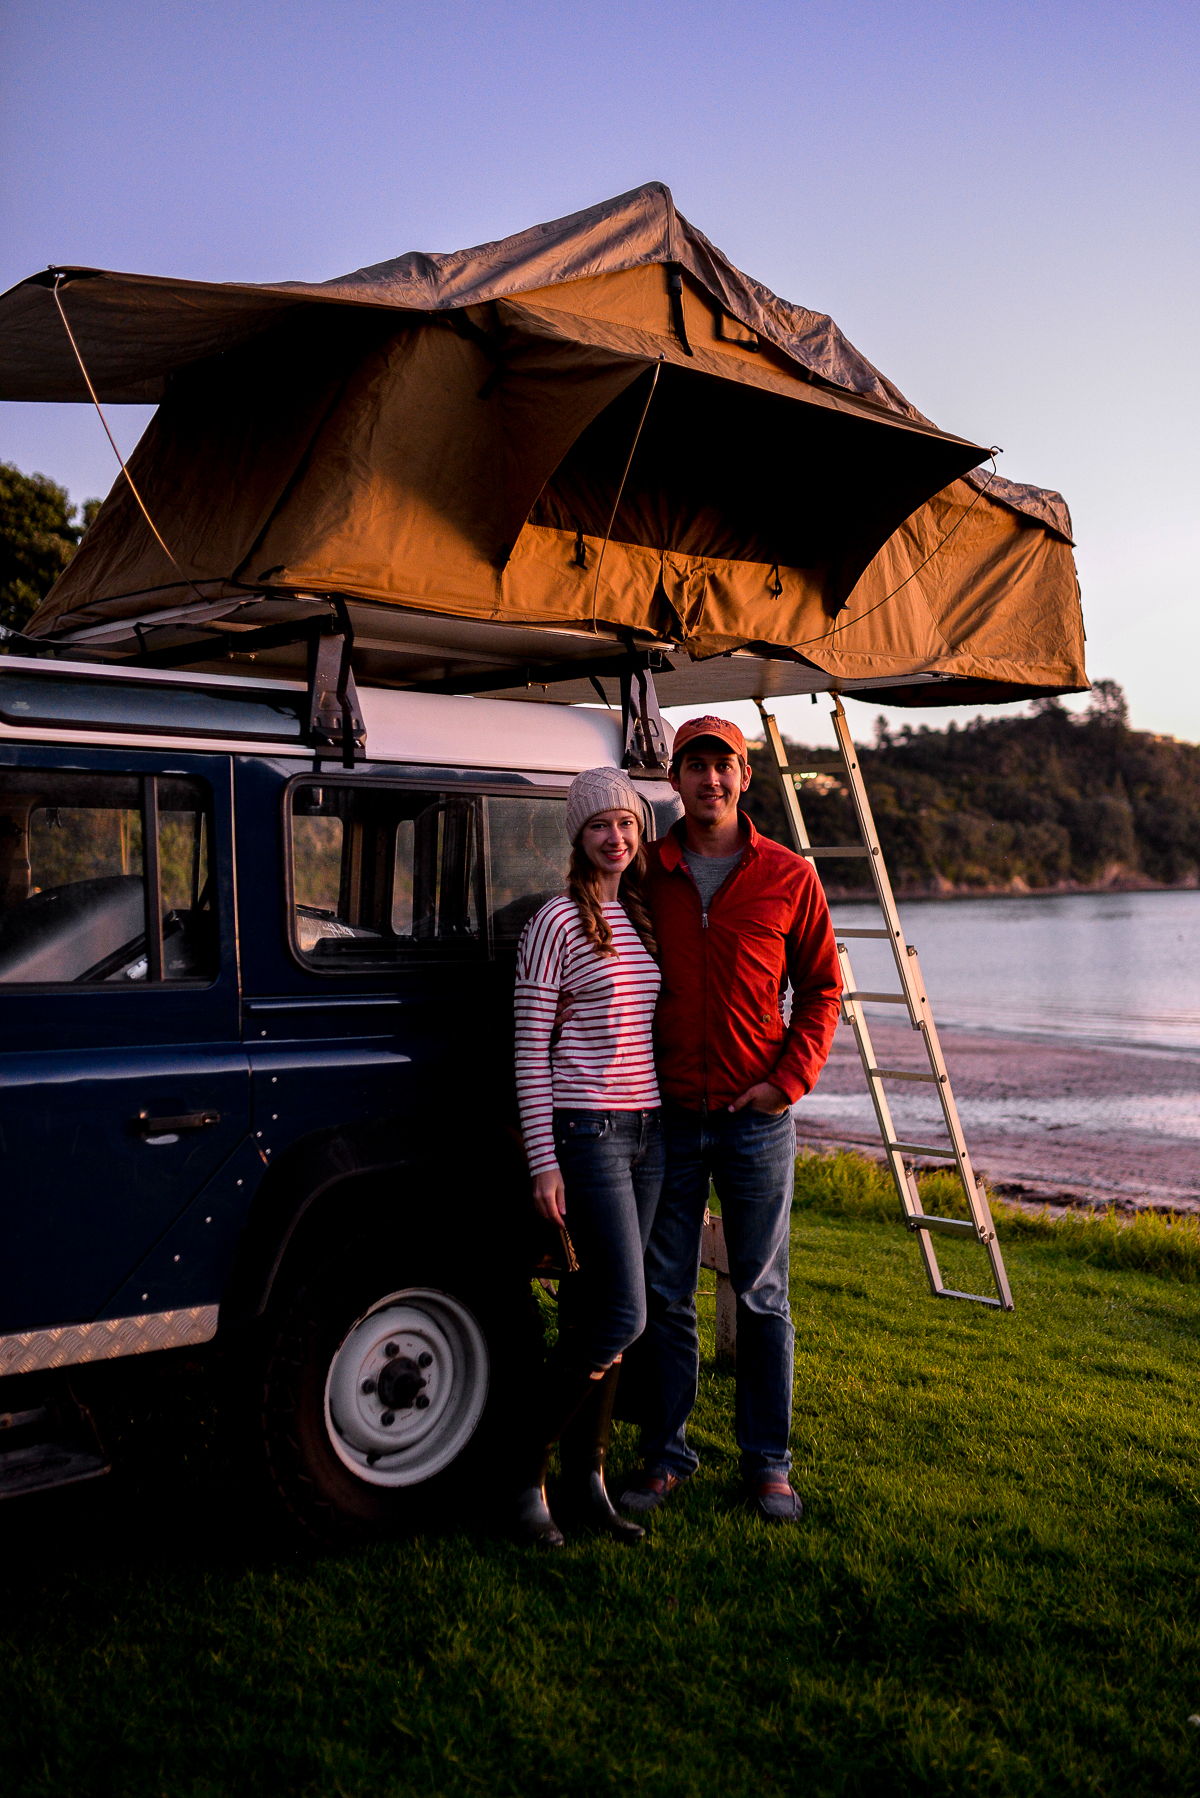 Stacie Flinner Land Rover Camping New Zealand-18.jpg